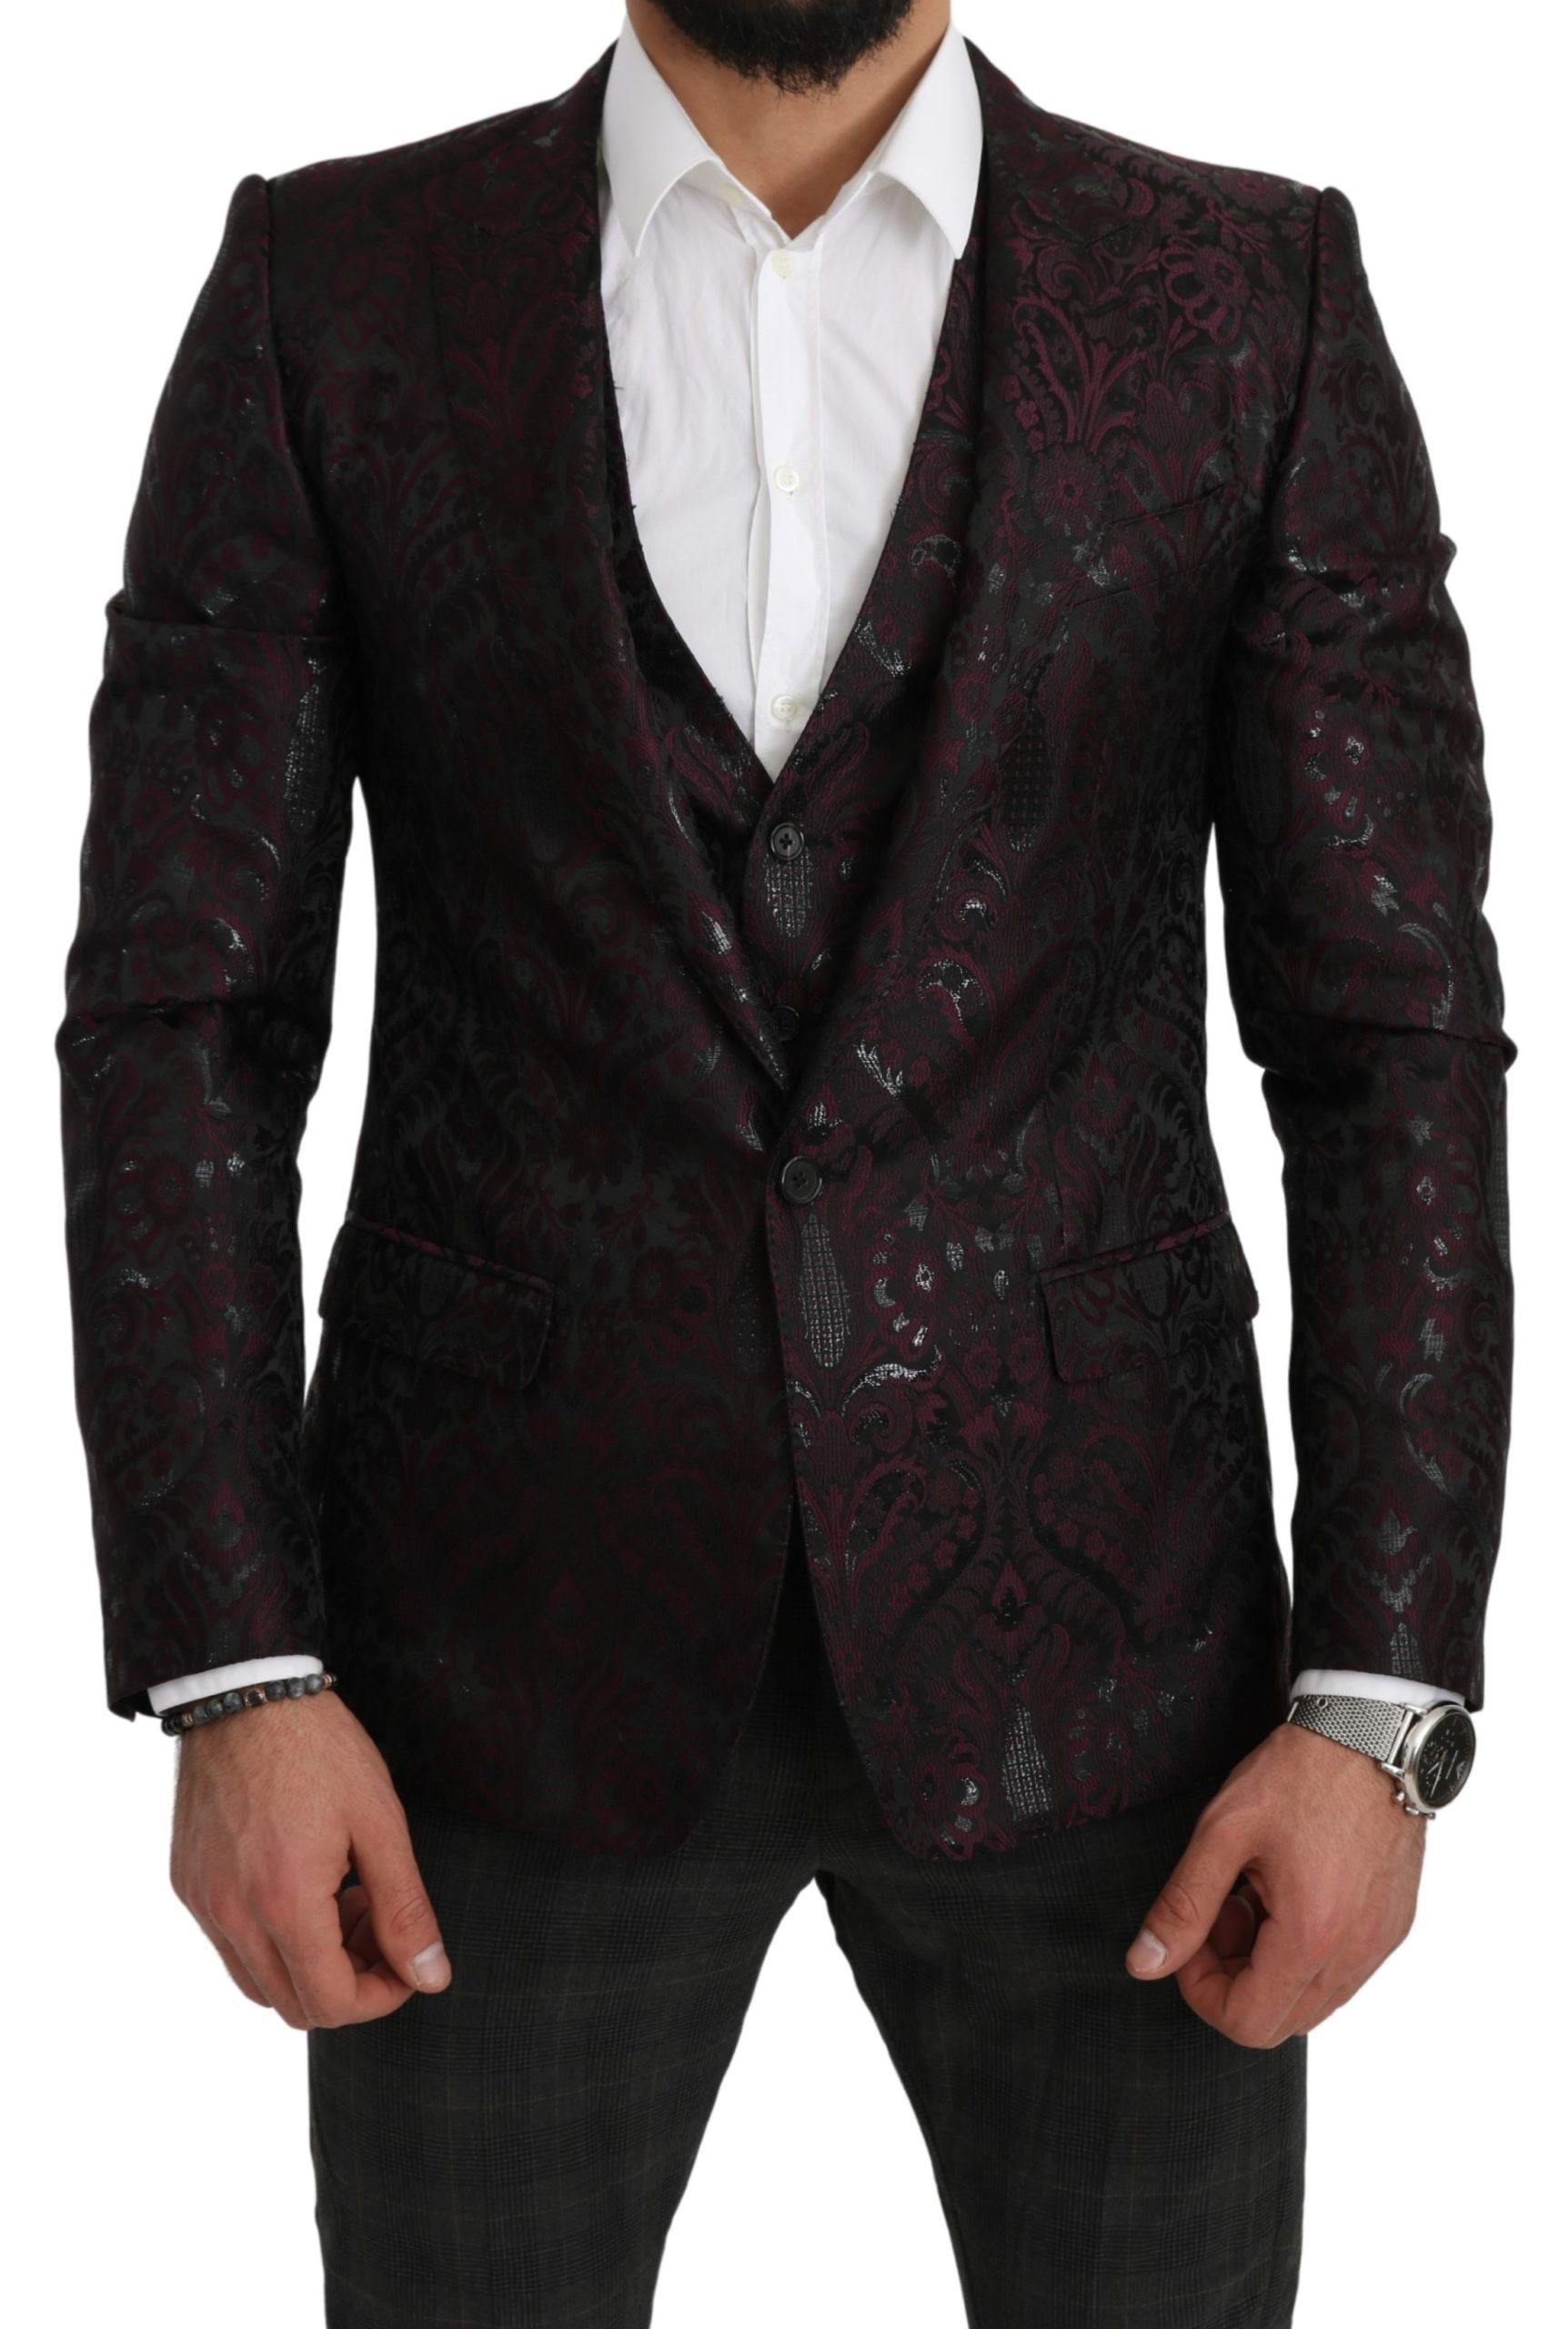 Dolce & Gabbana Men's Jacquard Floral Slim Fit Blazer Black KOS1806 - IT48 | M